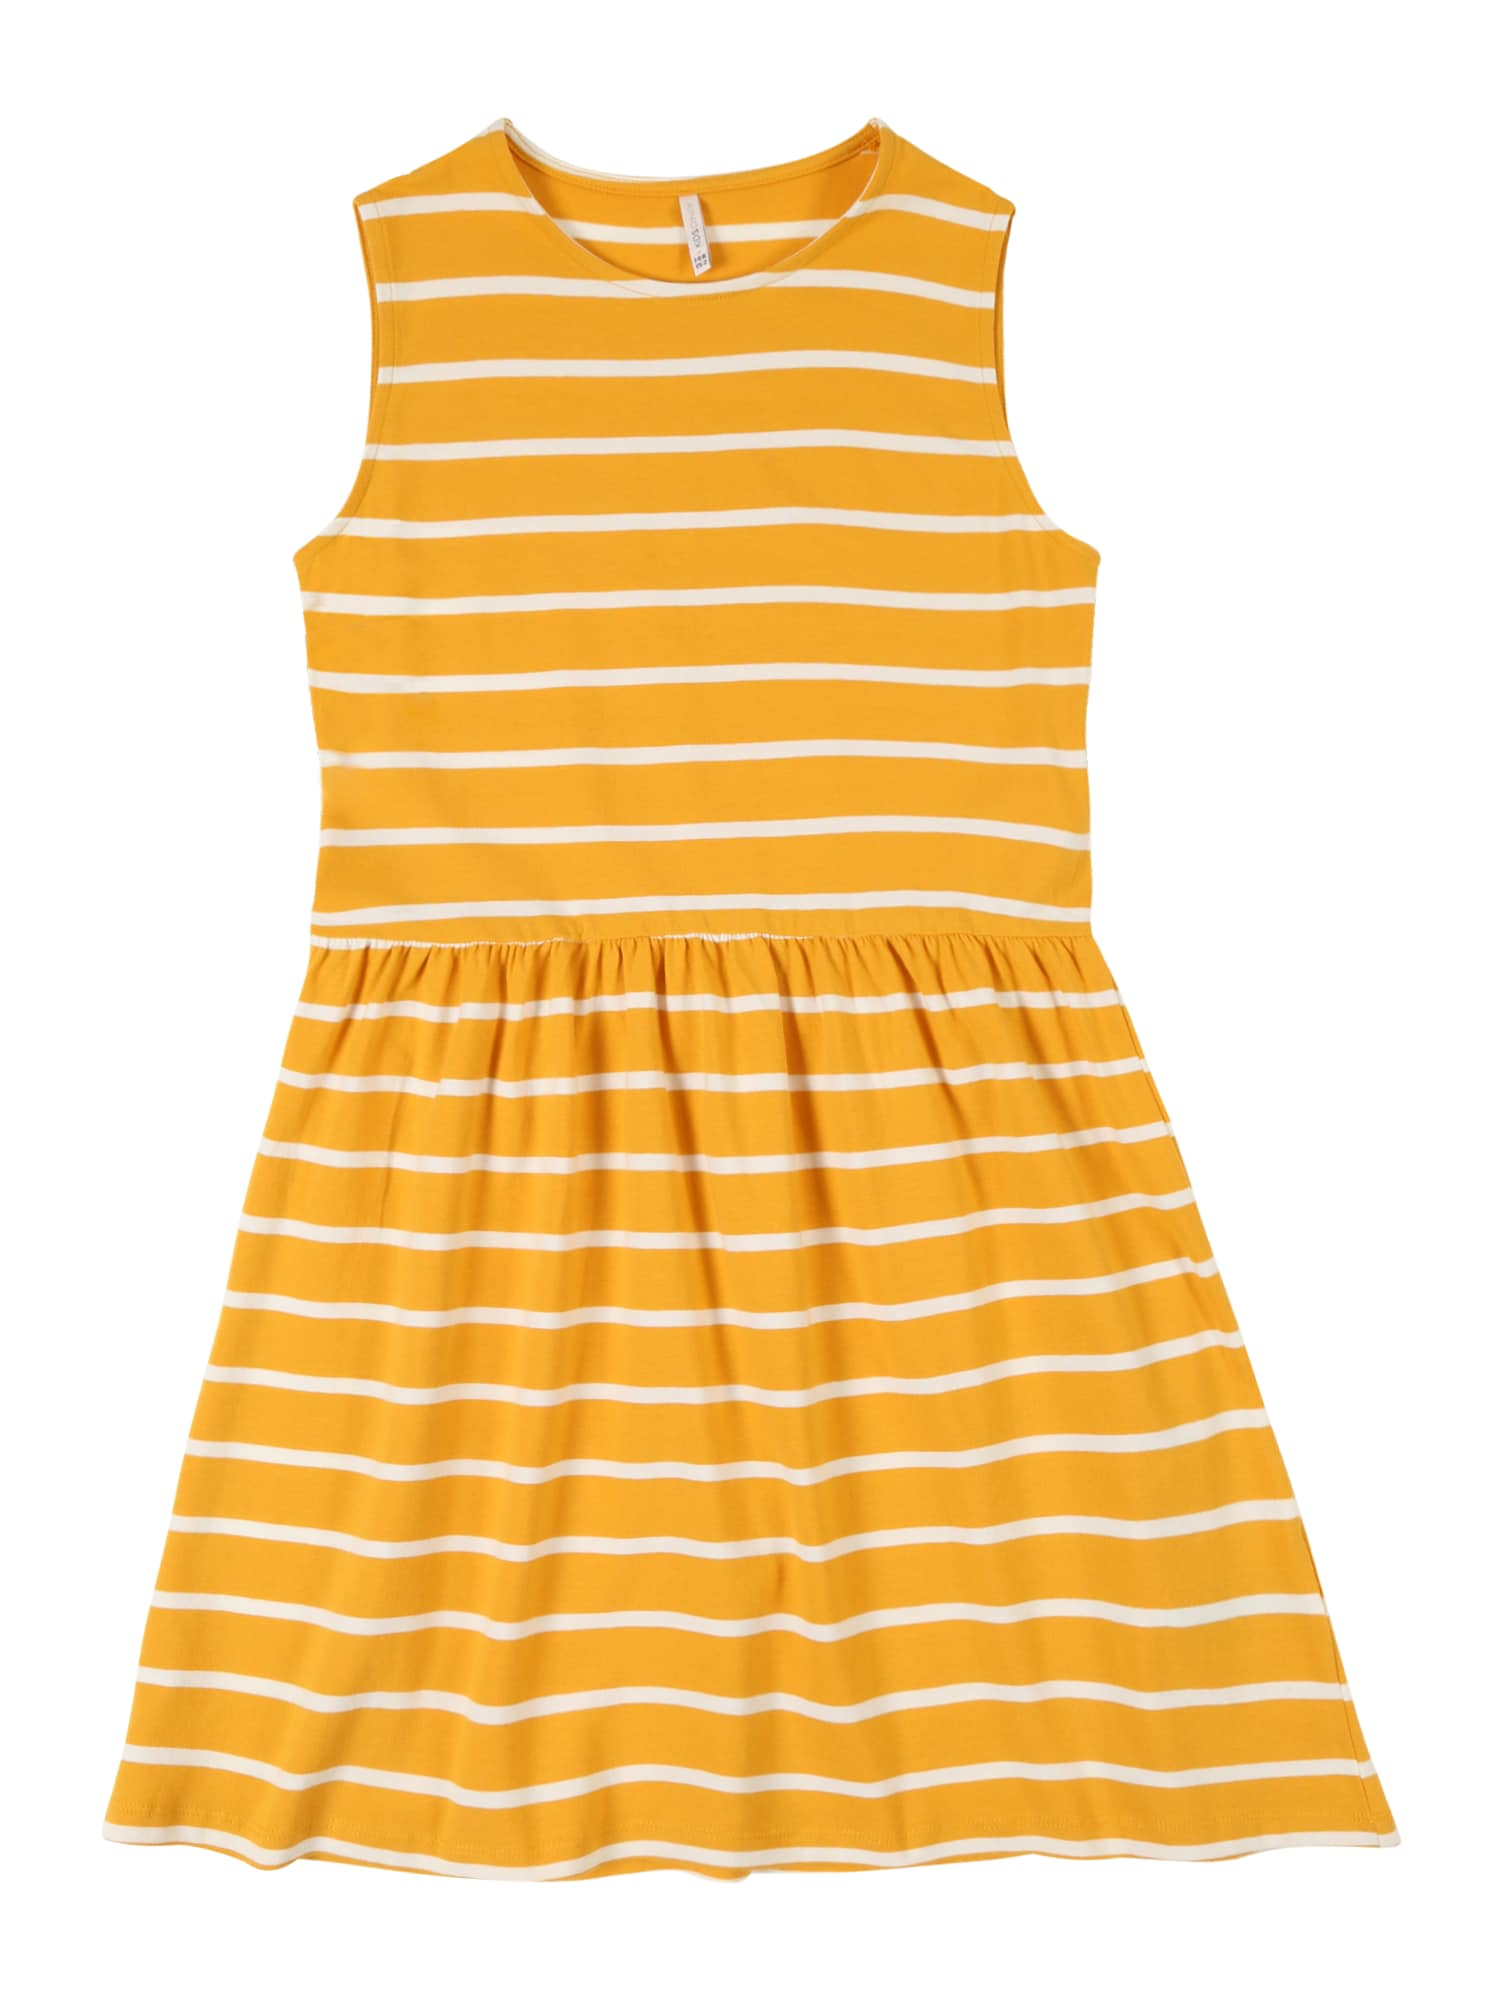 Šaty NIELLA tmavě žlutá bílá KIDS ONLY